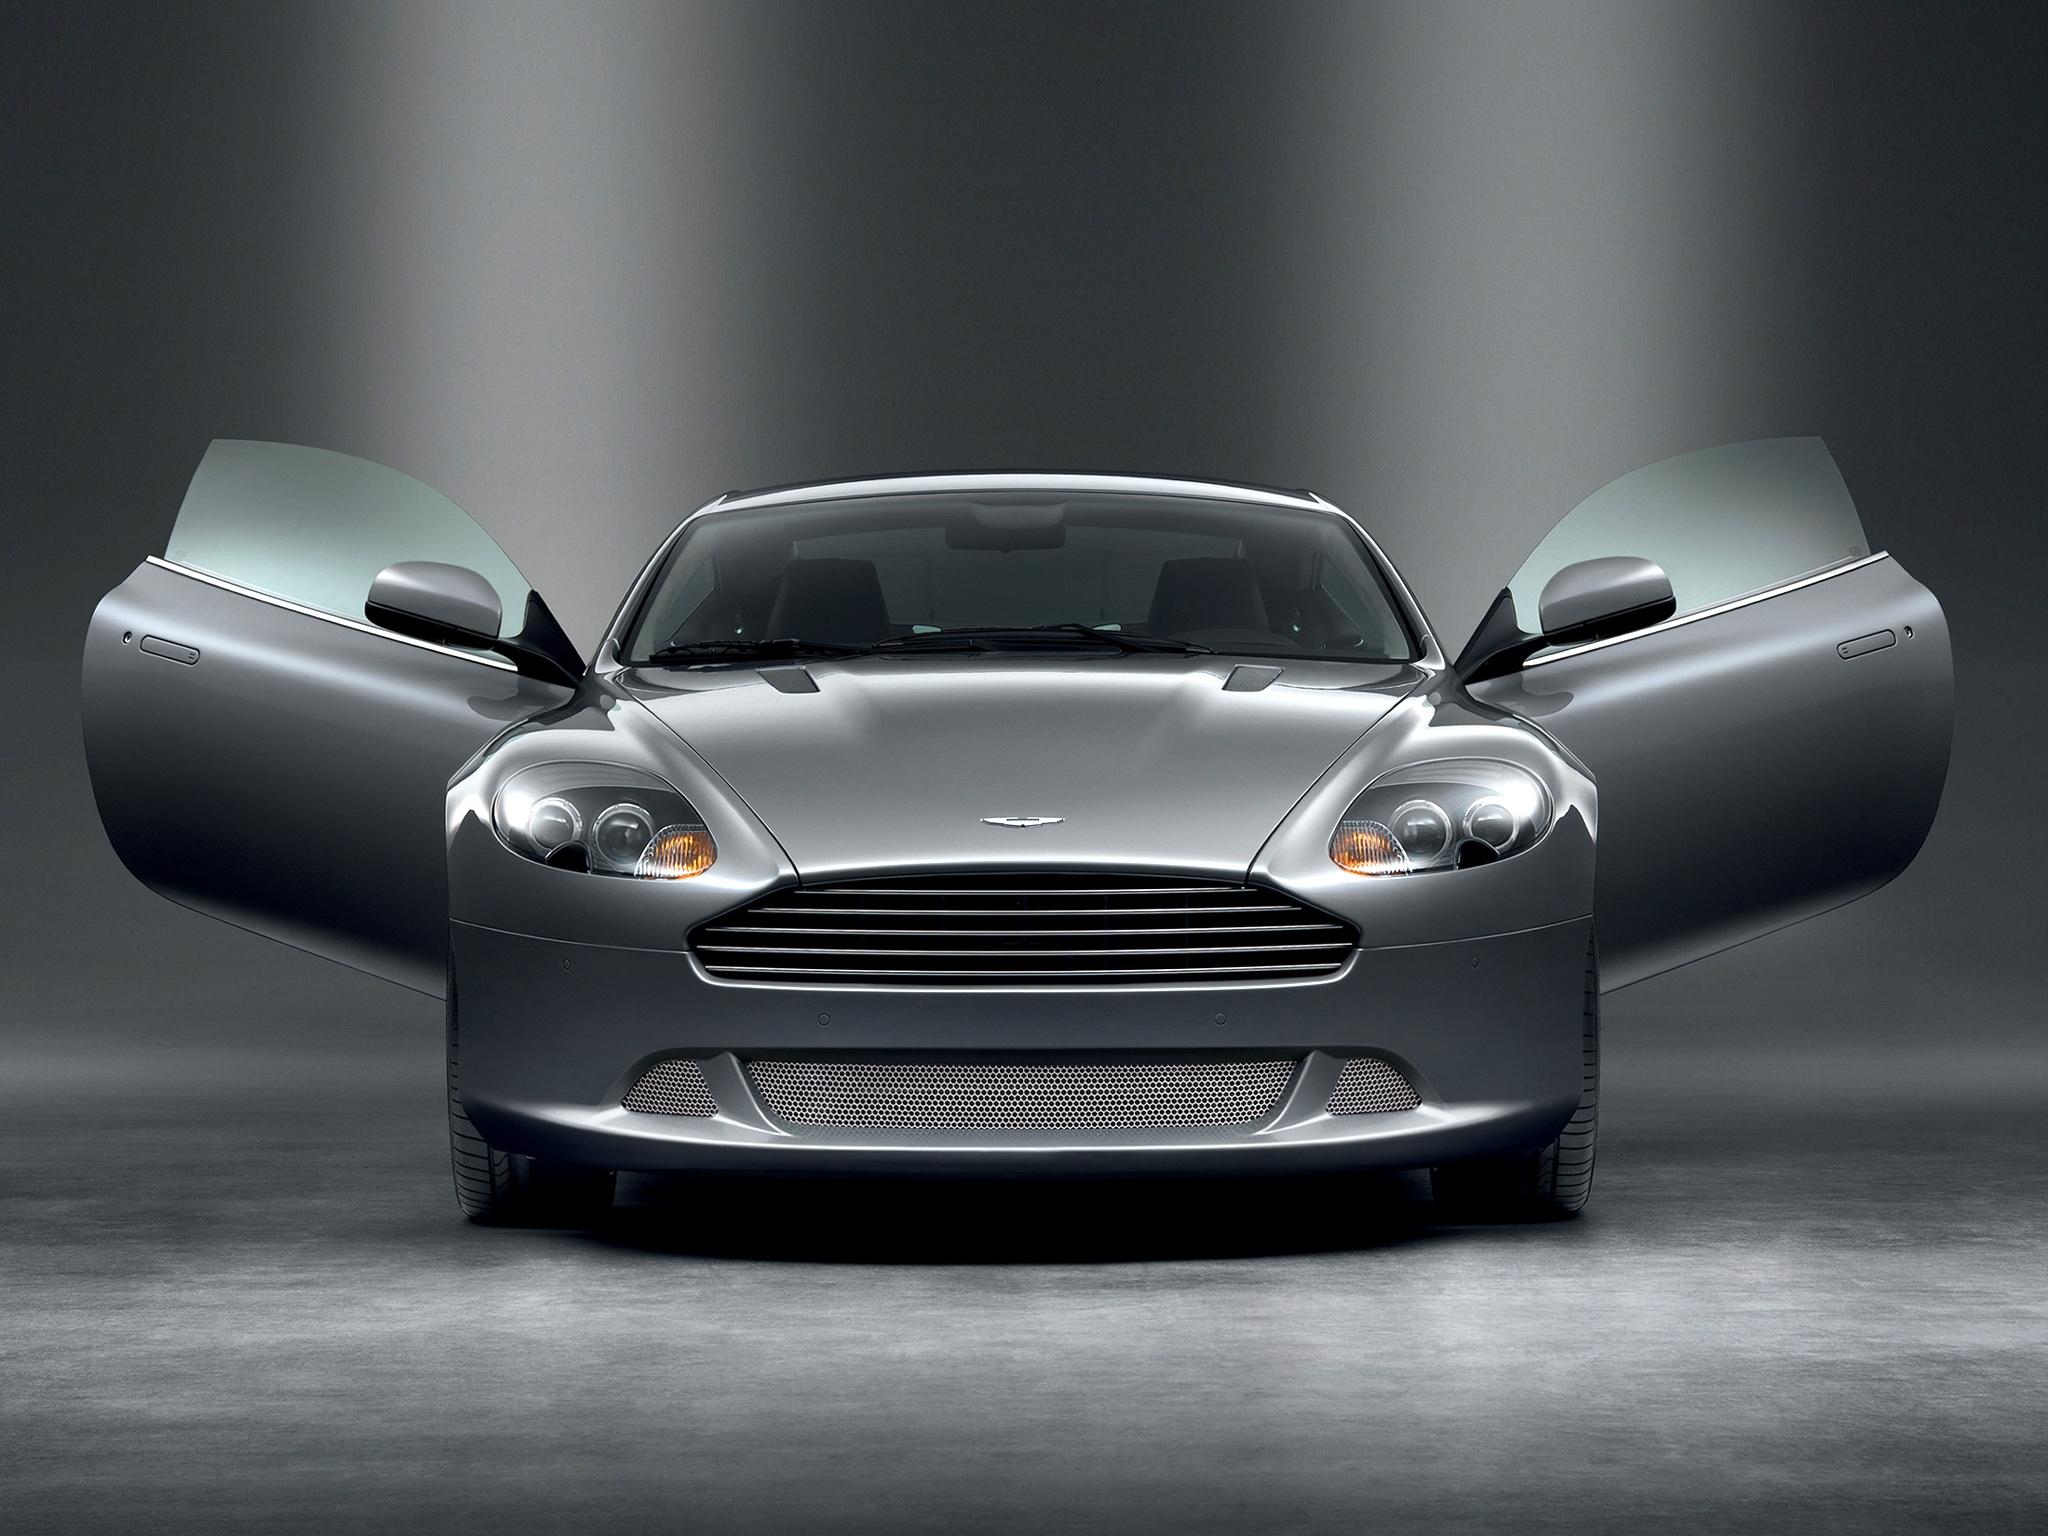 99543 скачать обои Астон Мартин (Aston Martin), Спорт, Машины, Тачки (Cars), Вид Спереди, Серый, 2008, Db9 - заставки и картинки бесплатно